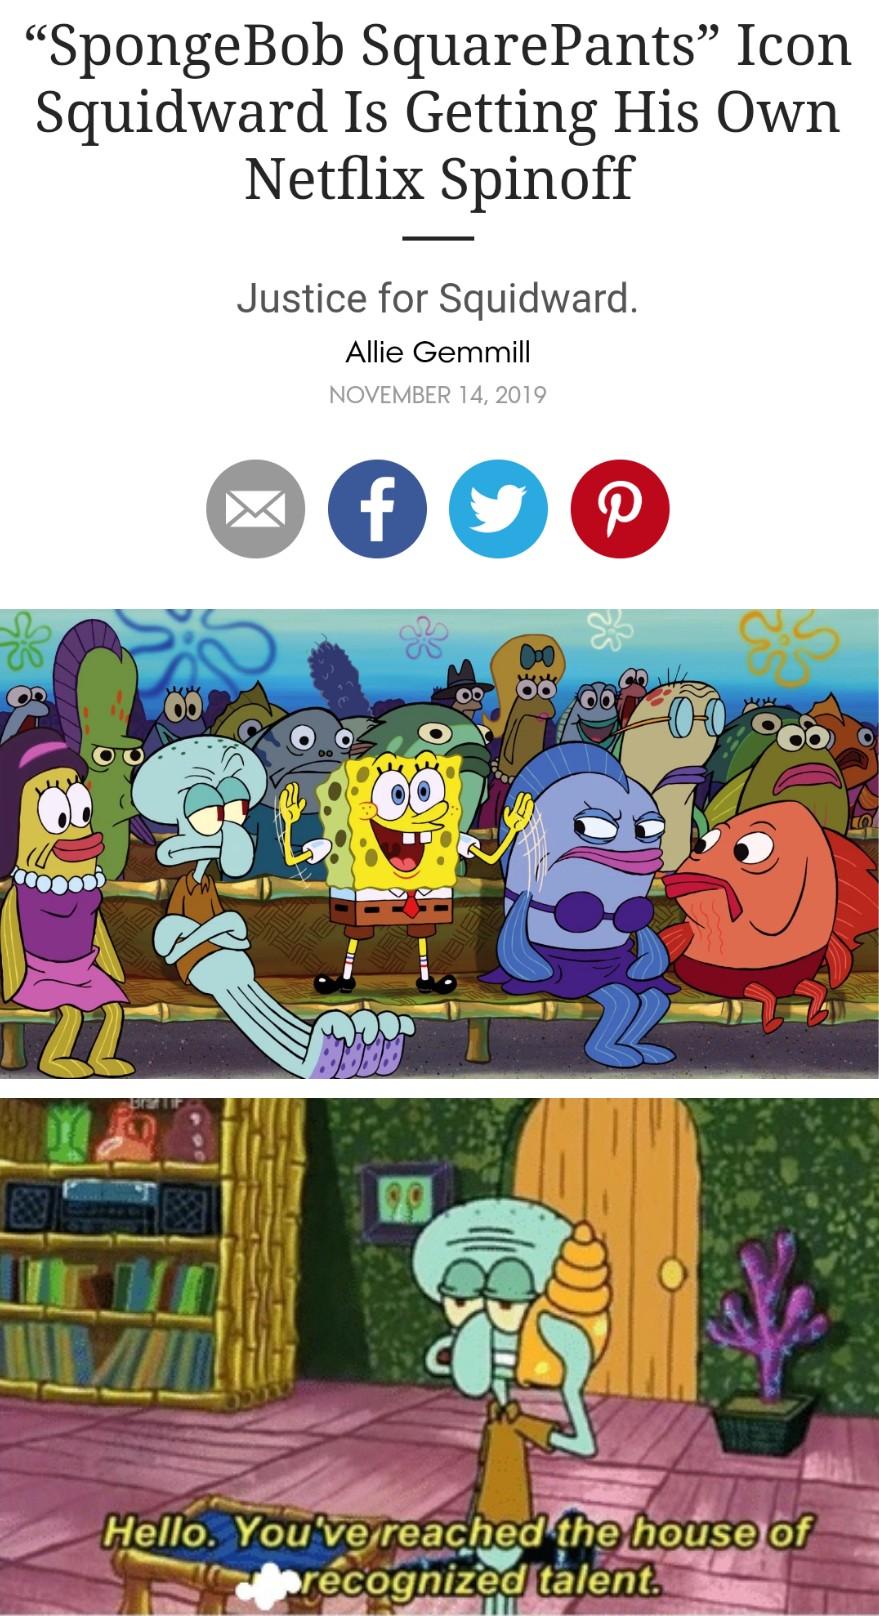 Squidward Spinoff : squidward, spinoff, Squidward!, /r/BikiniBottomTwitter, SpongeBob, SquarePants